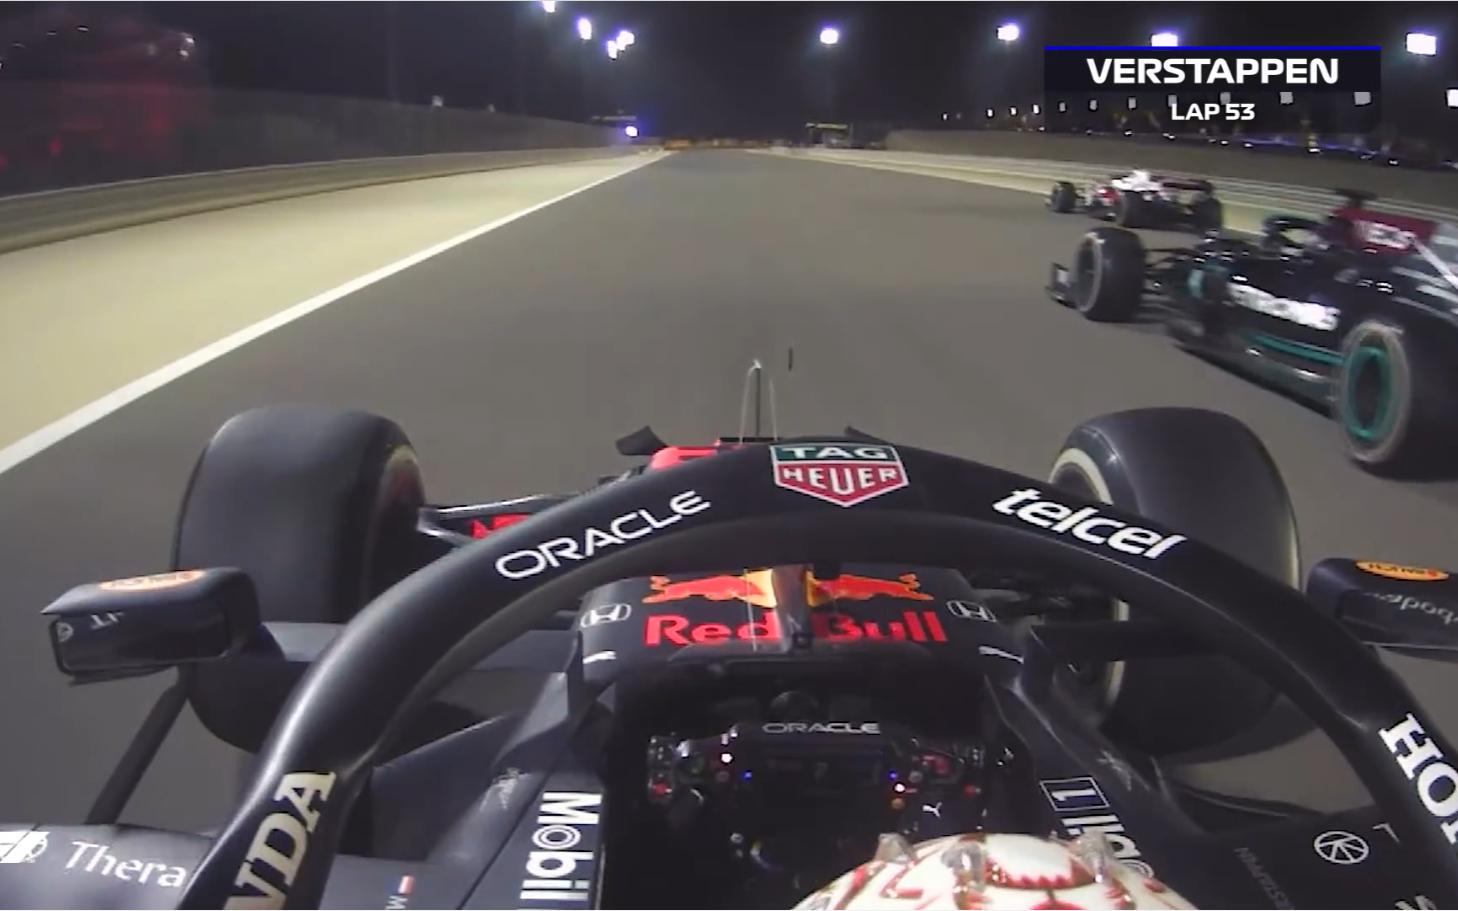 F1 2021巴林,十大精彩瞬间,维斯塔潘正面PK汉密尔顿,新秀马泽平37秒完成退赛